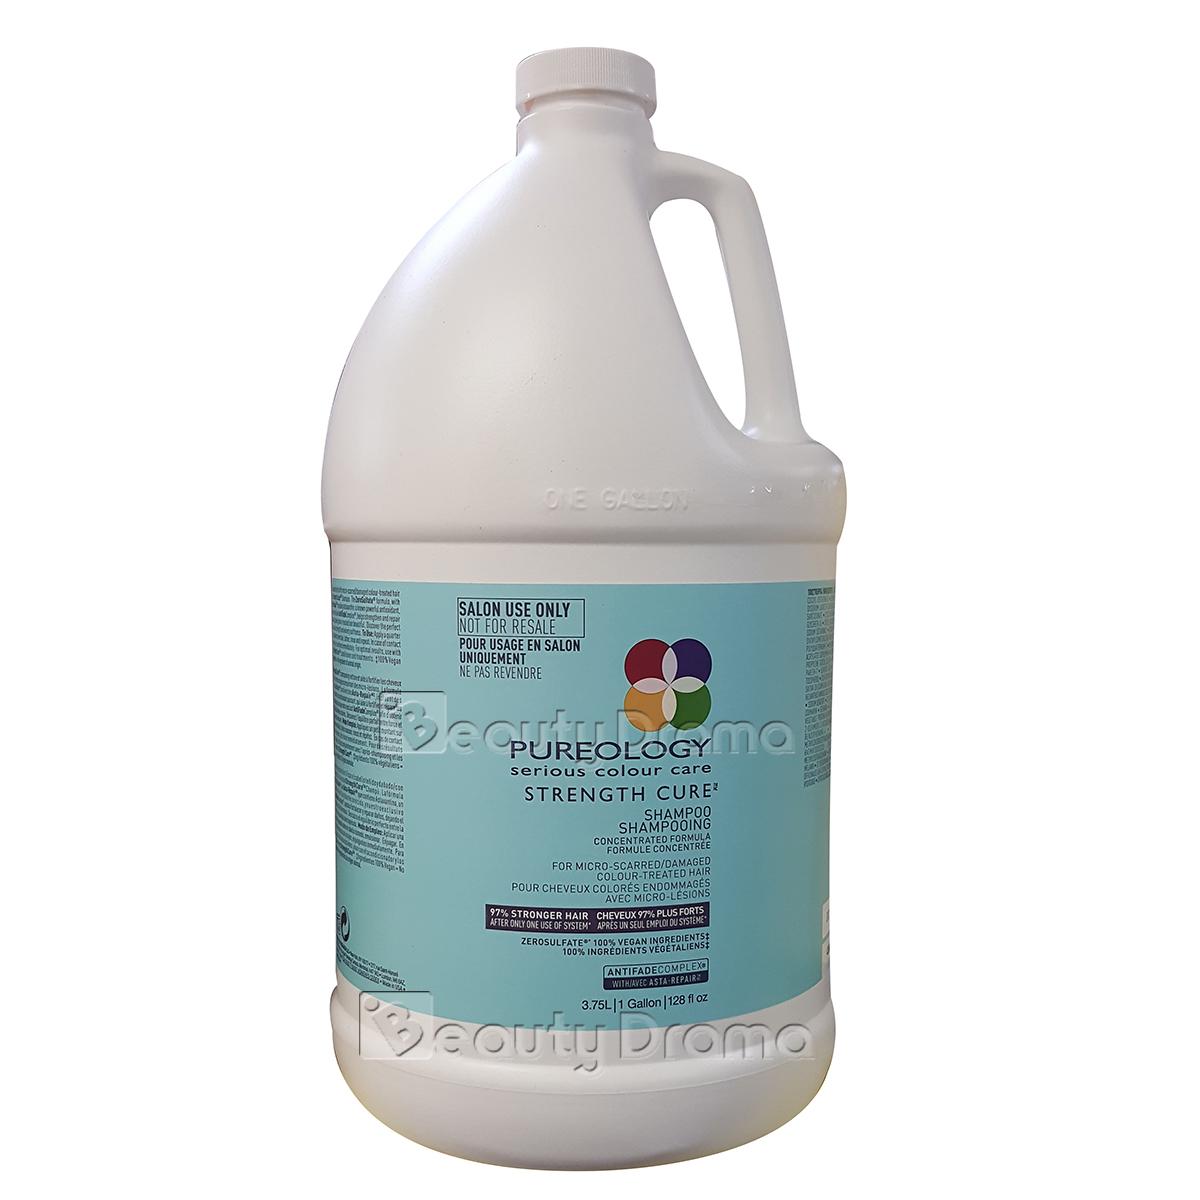 Pureology Strength Cure Shampoo 1 Gallon